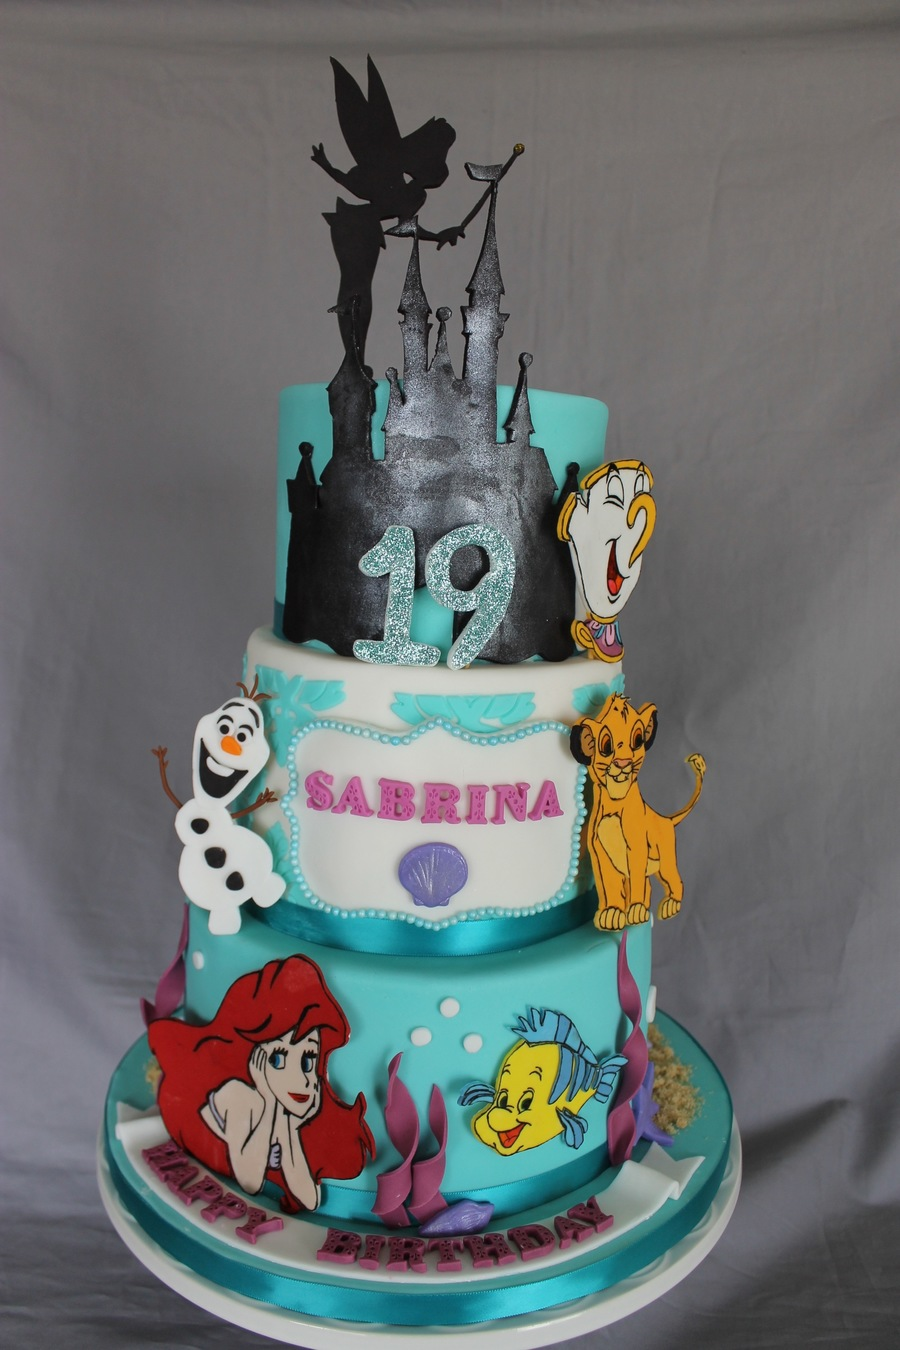 Remarkable 7 Disney Anniversary Cakes Photo Happy Birthday Cake Disney Funny Birthday Cards Online Bapapcheapnameinfo